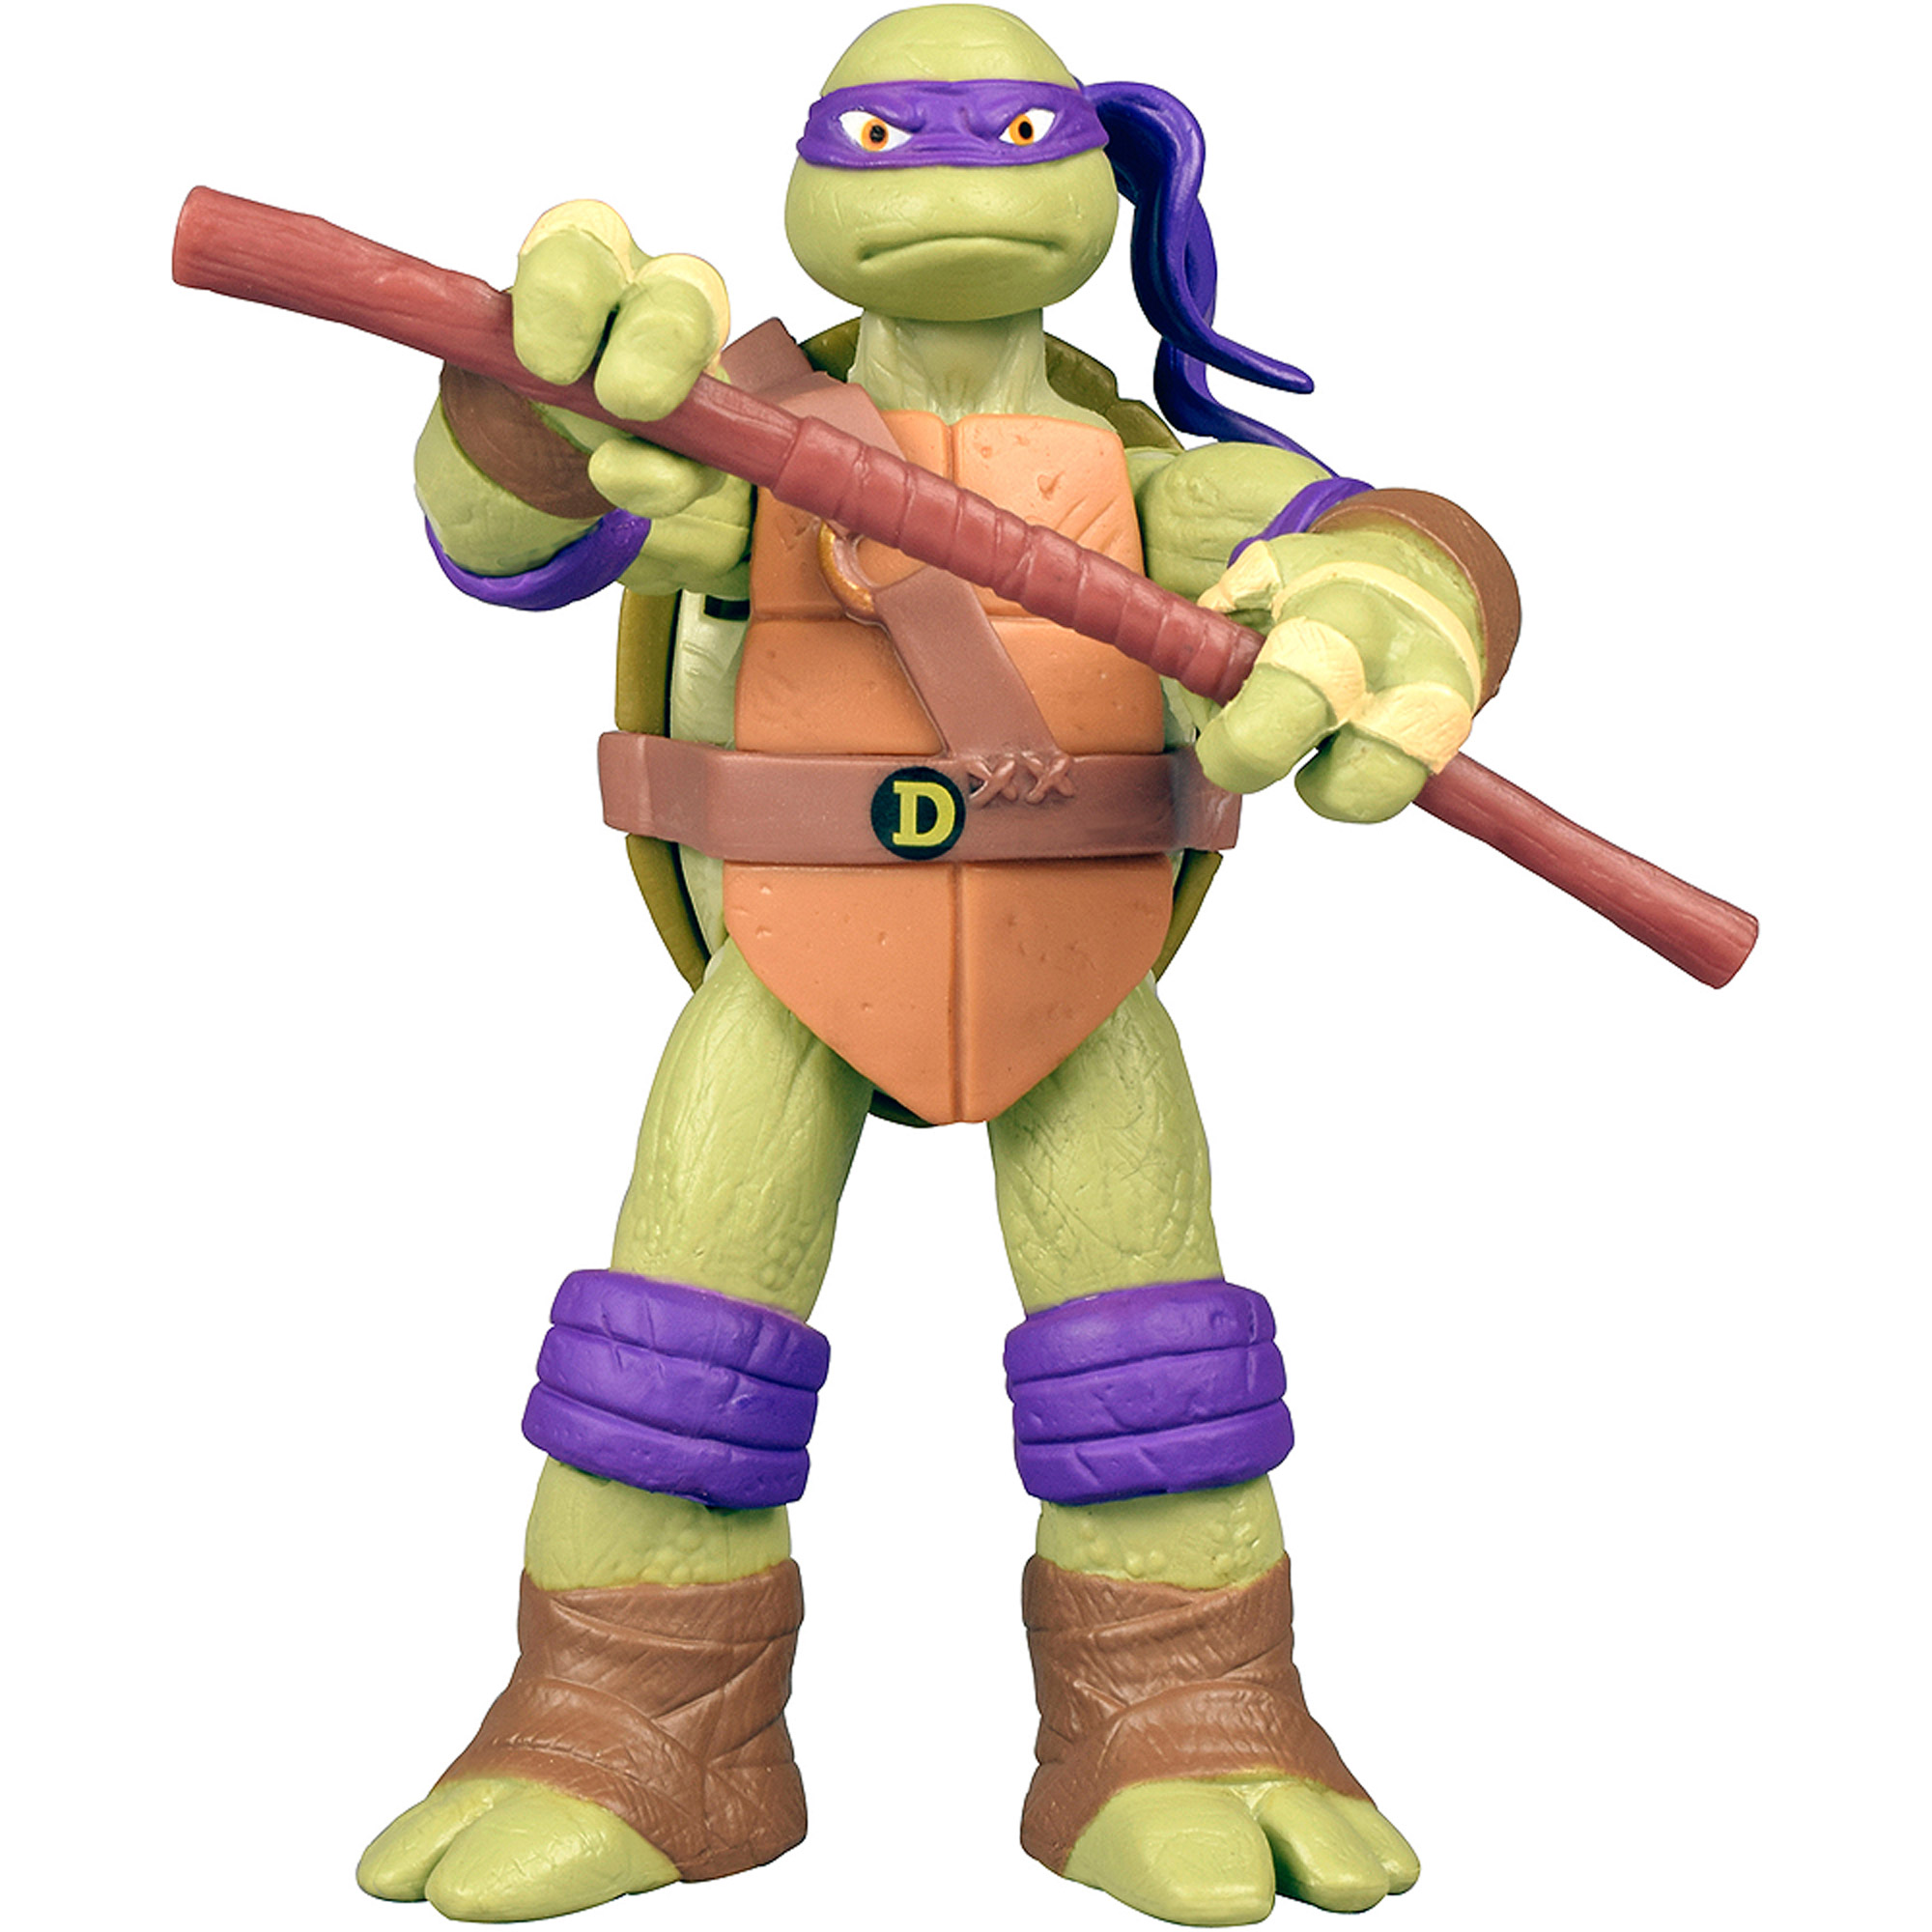 Nickelodeon Teenage Mutant Ninja Turtles Re-Deco Action Figure, Donatello